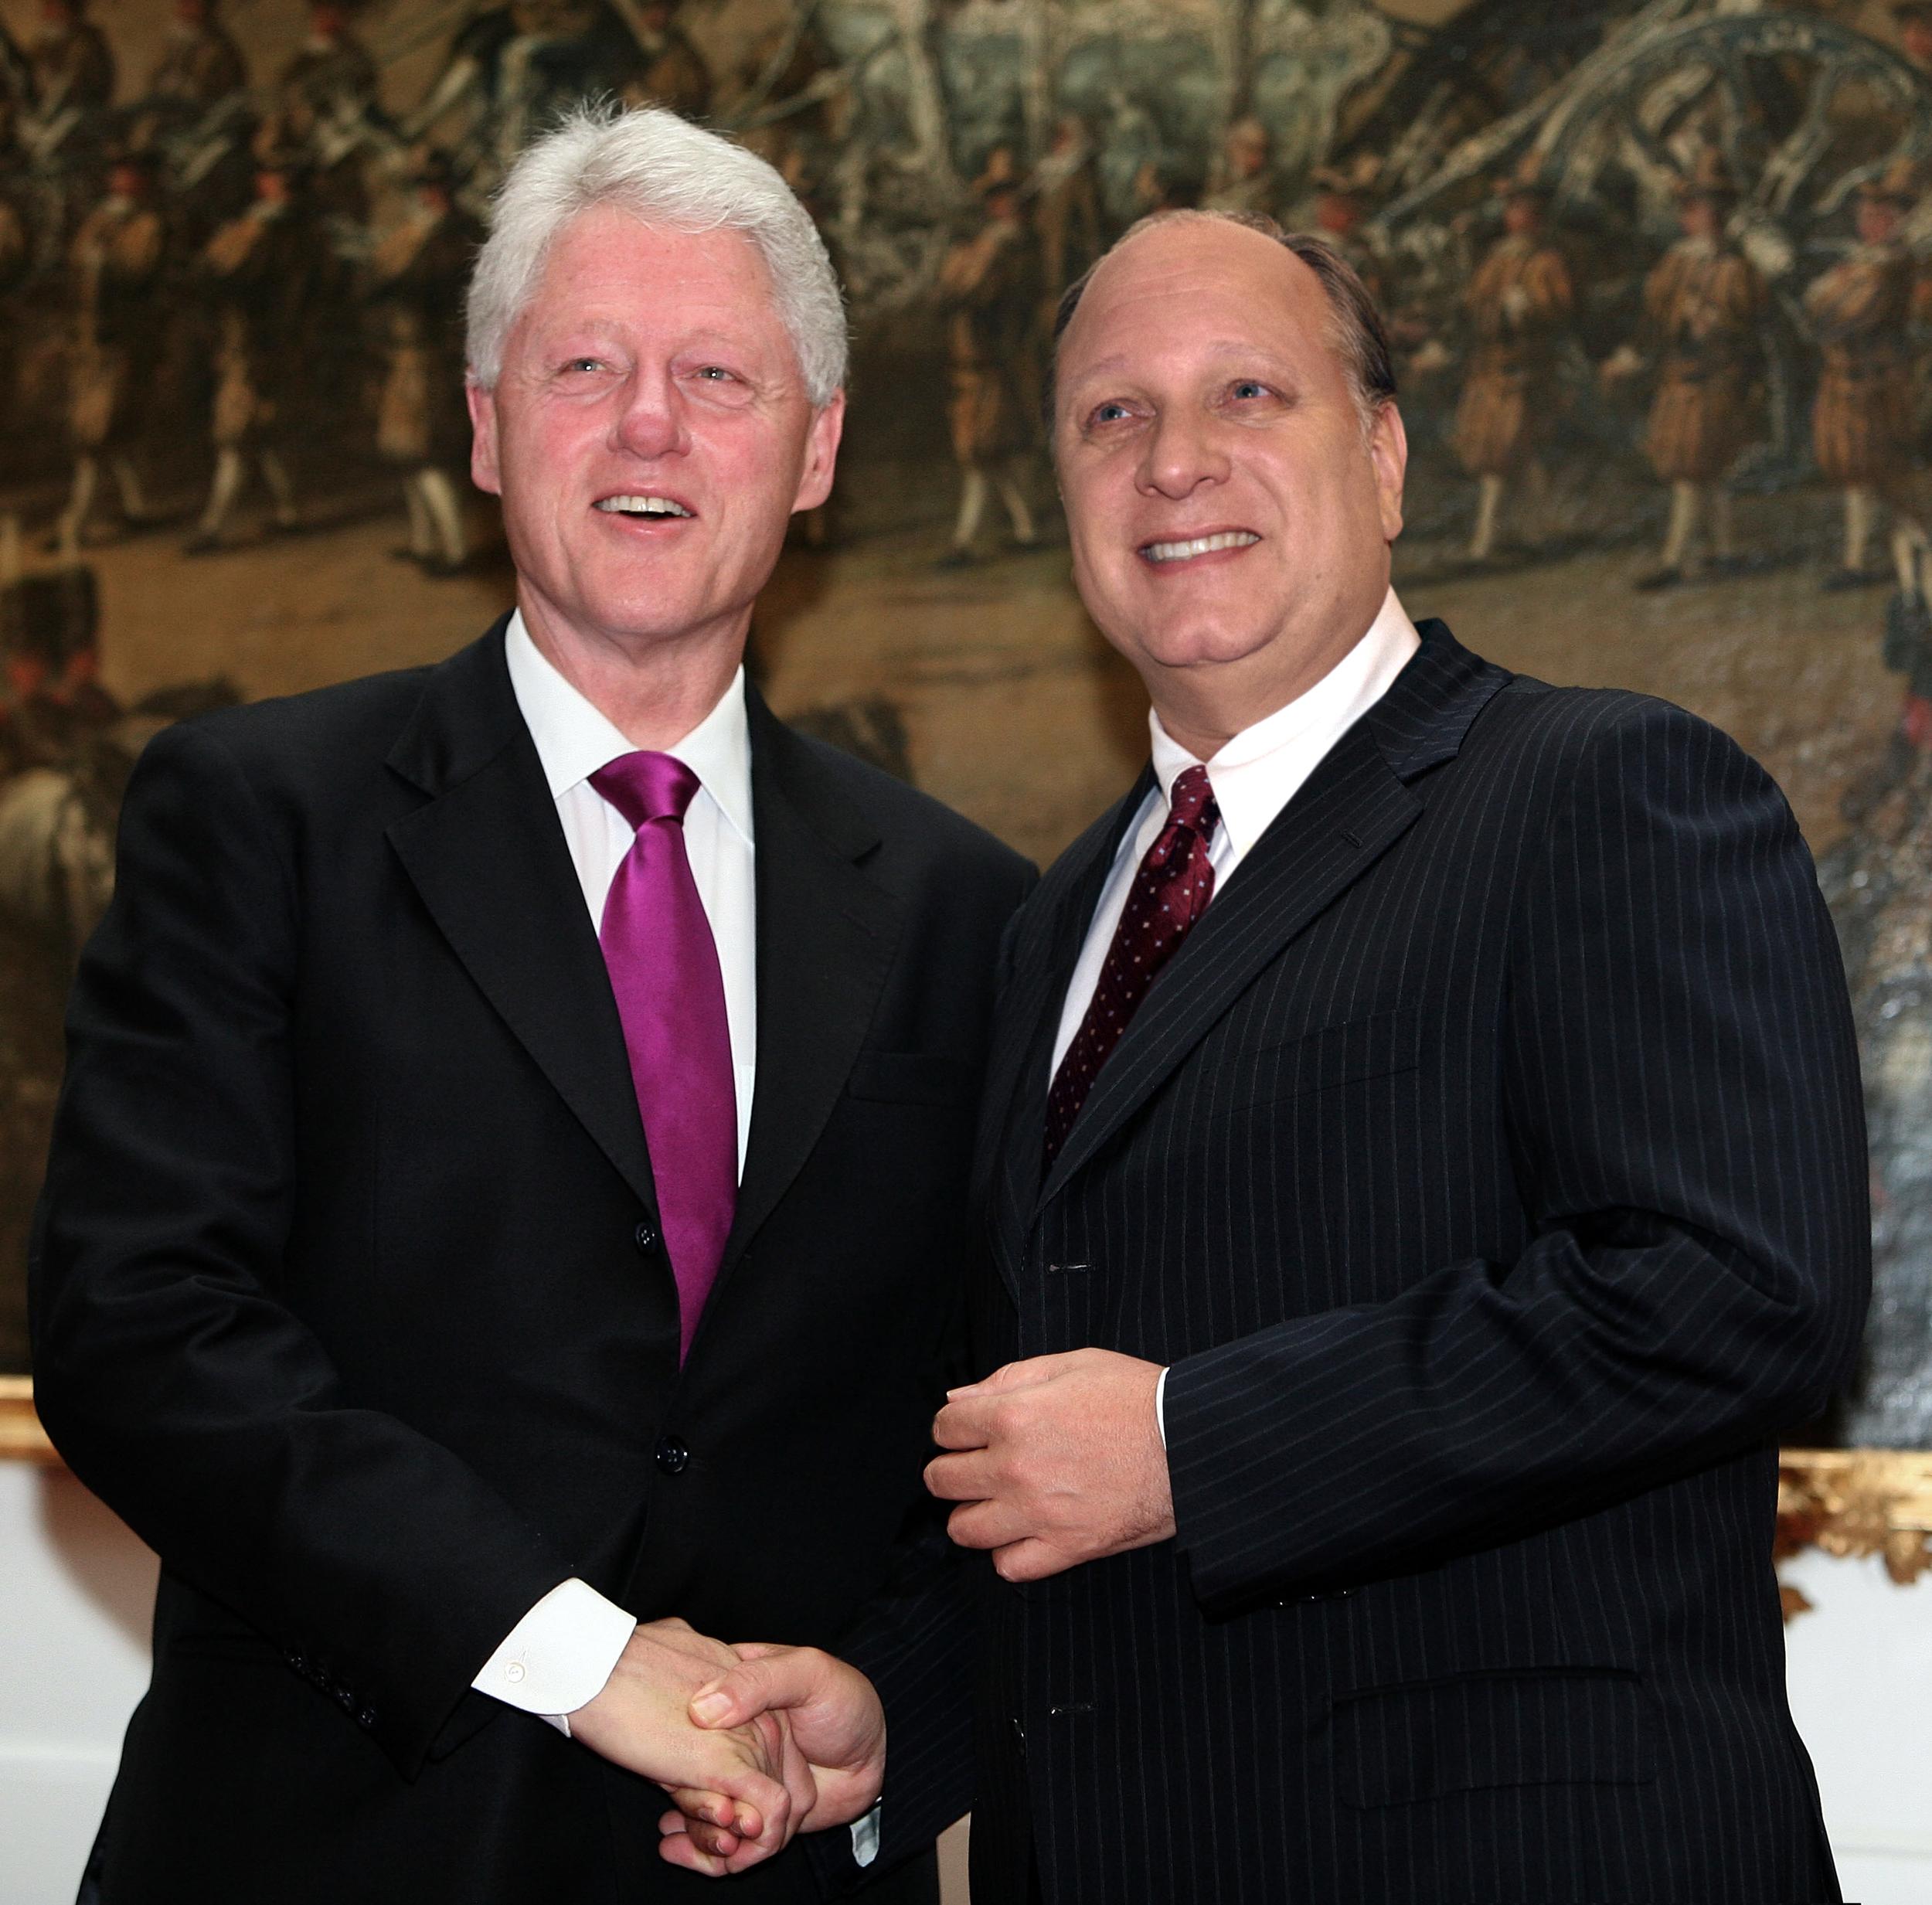 Clinton Photoshop 1.jpg